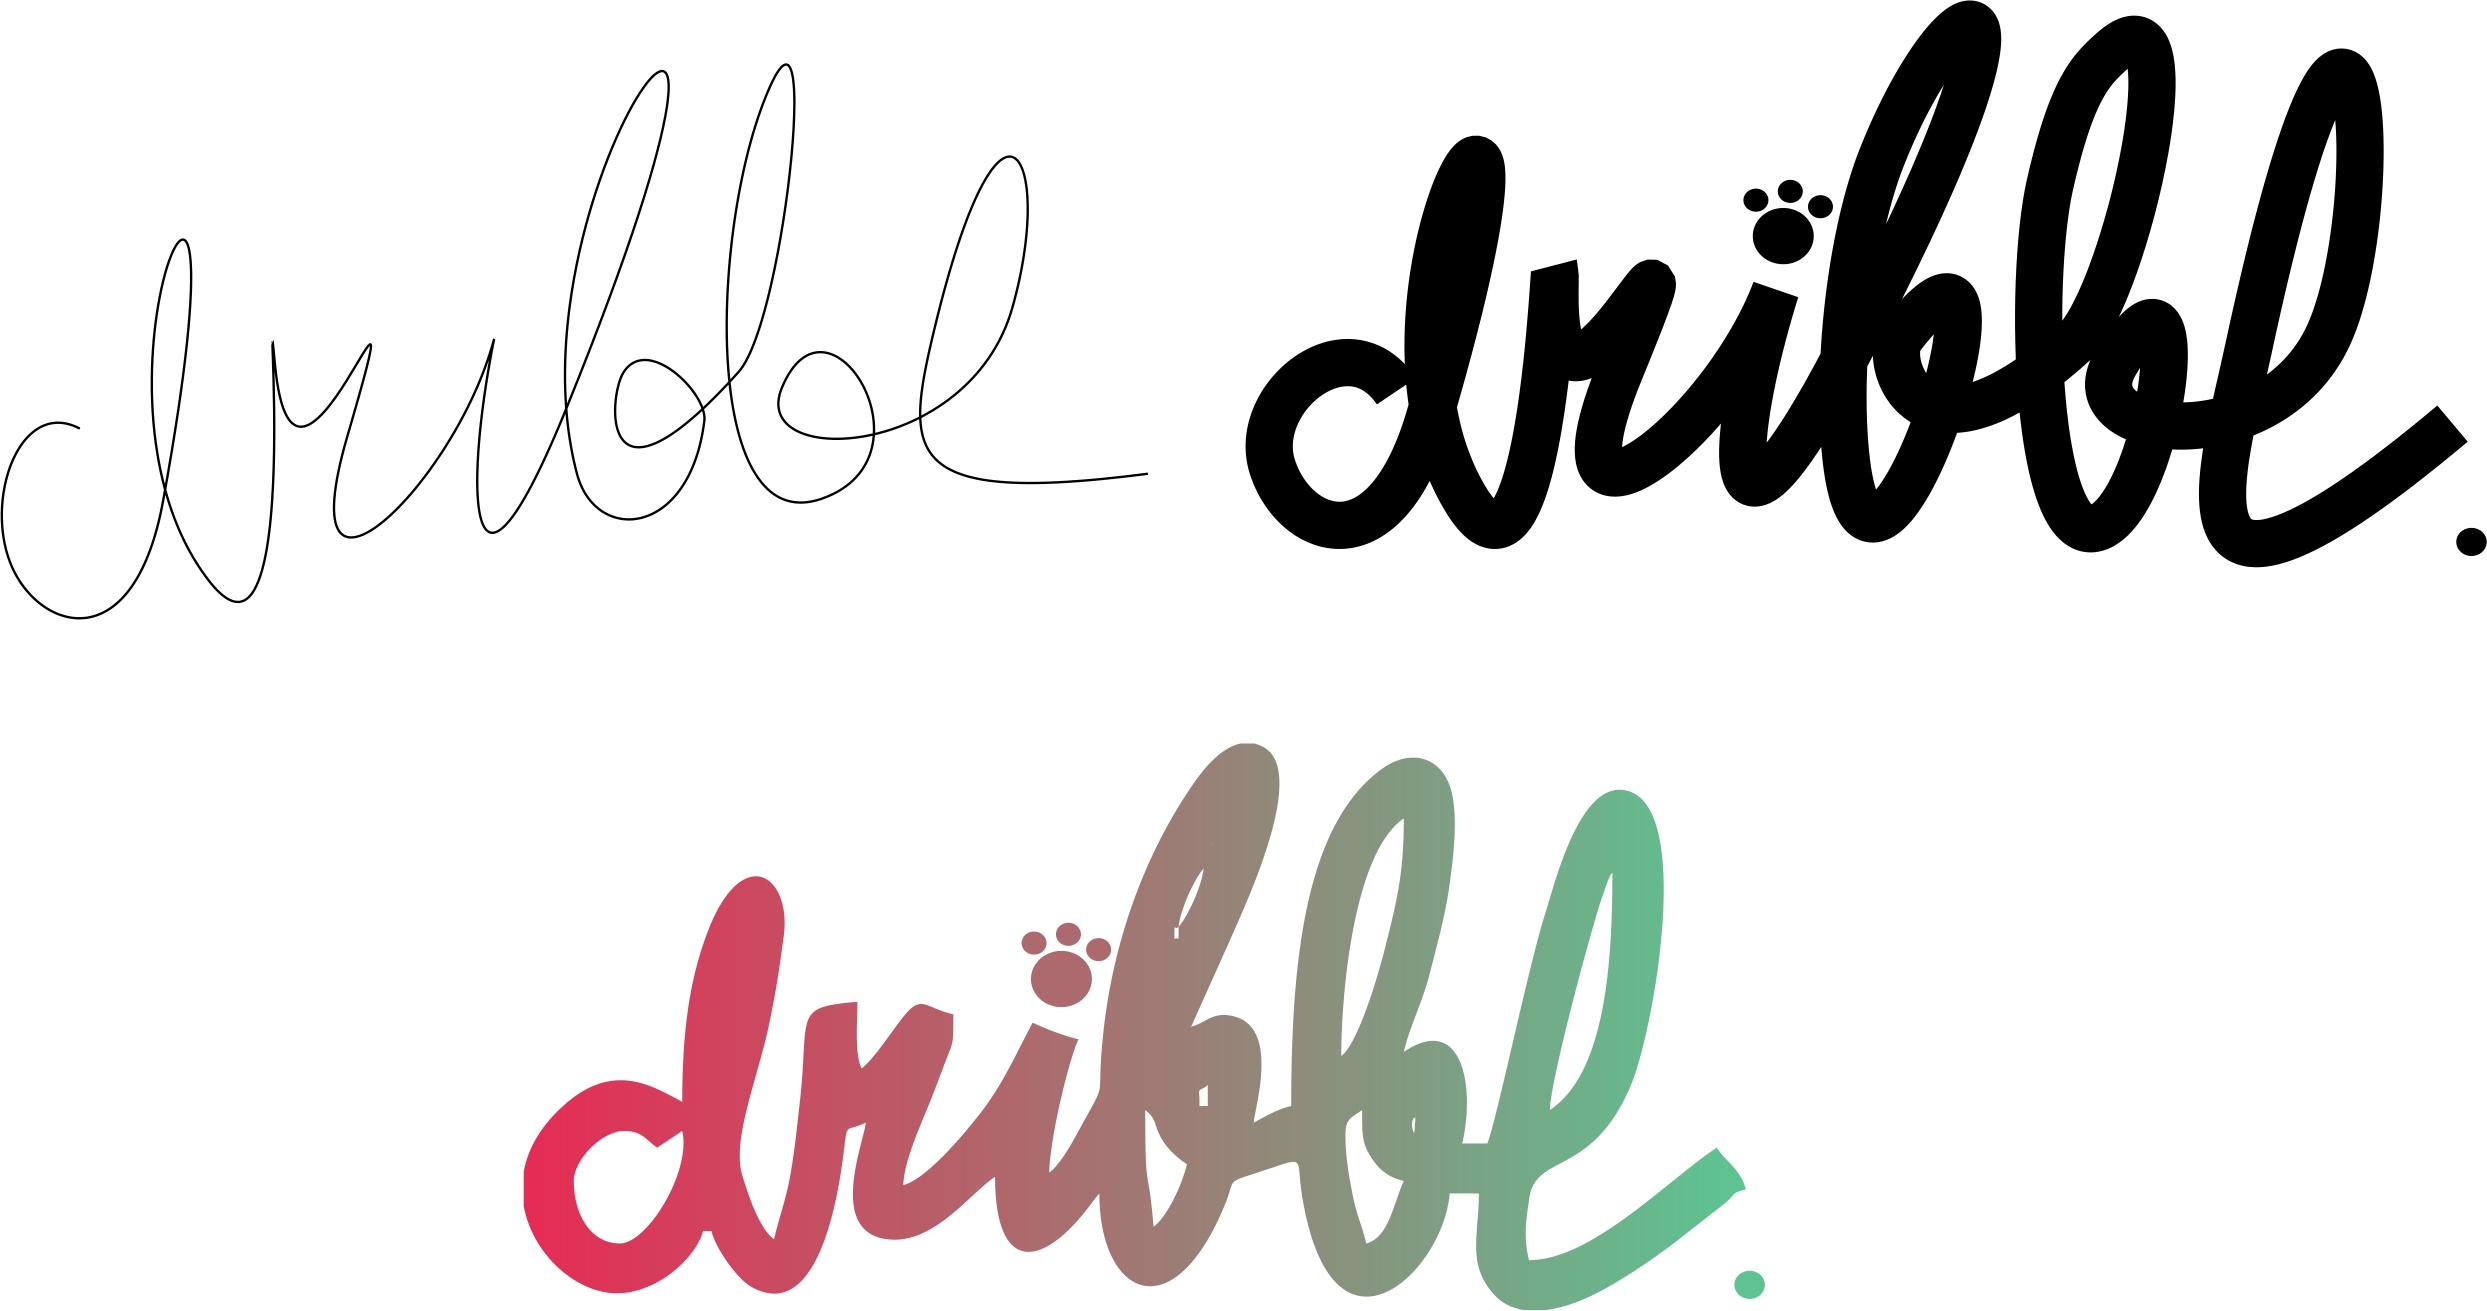 Разработка логотипа для сайта Dribbl.ru фото f_8475a9c36f5ecdcc.jpg